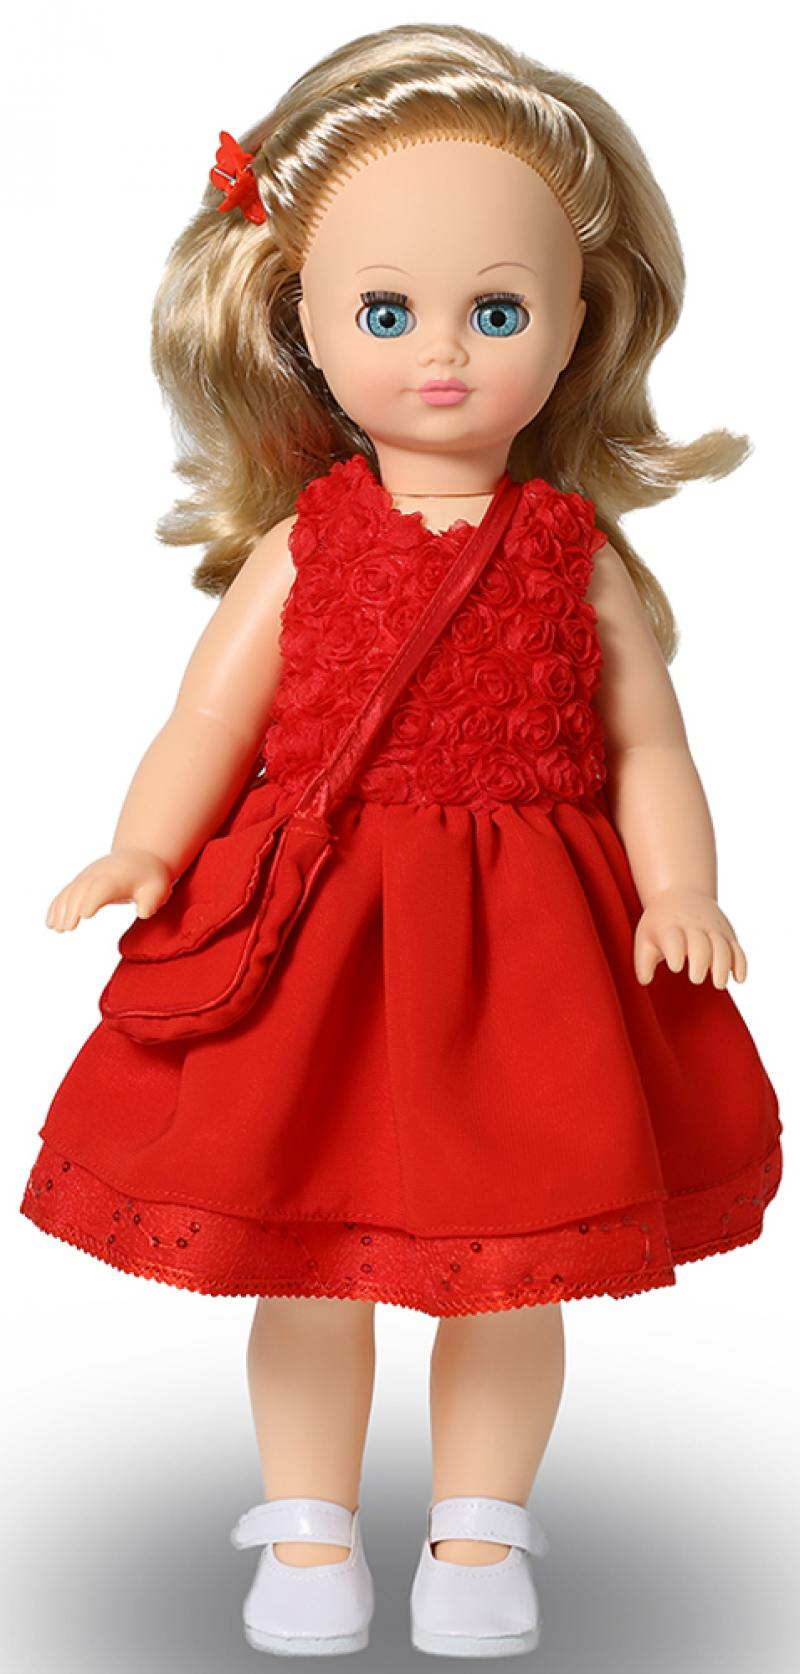 Кукла ВЕСНА Лиза 6 (озвученная) В2959/о